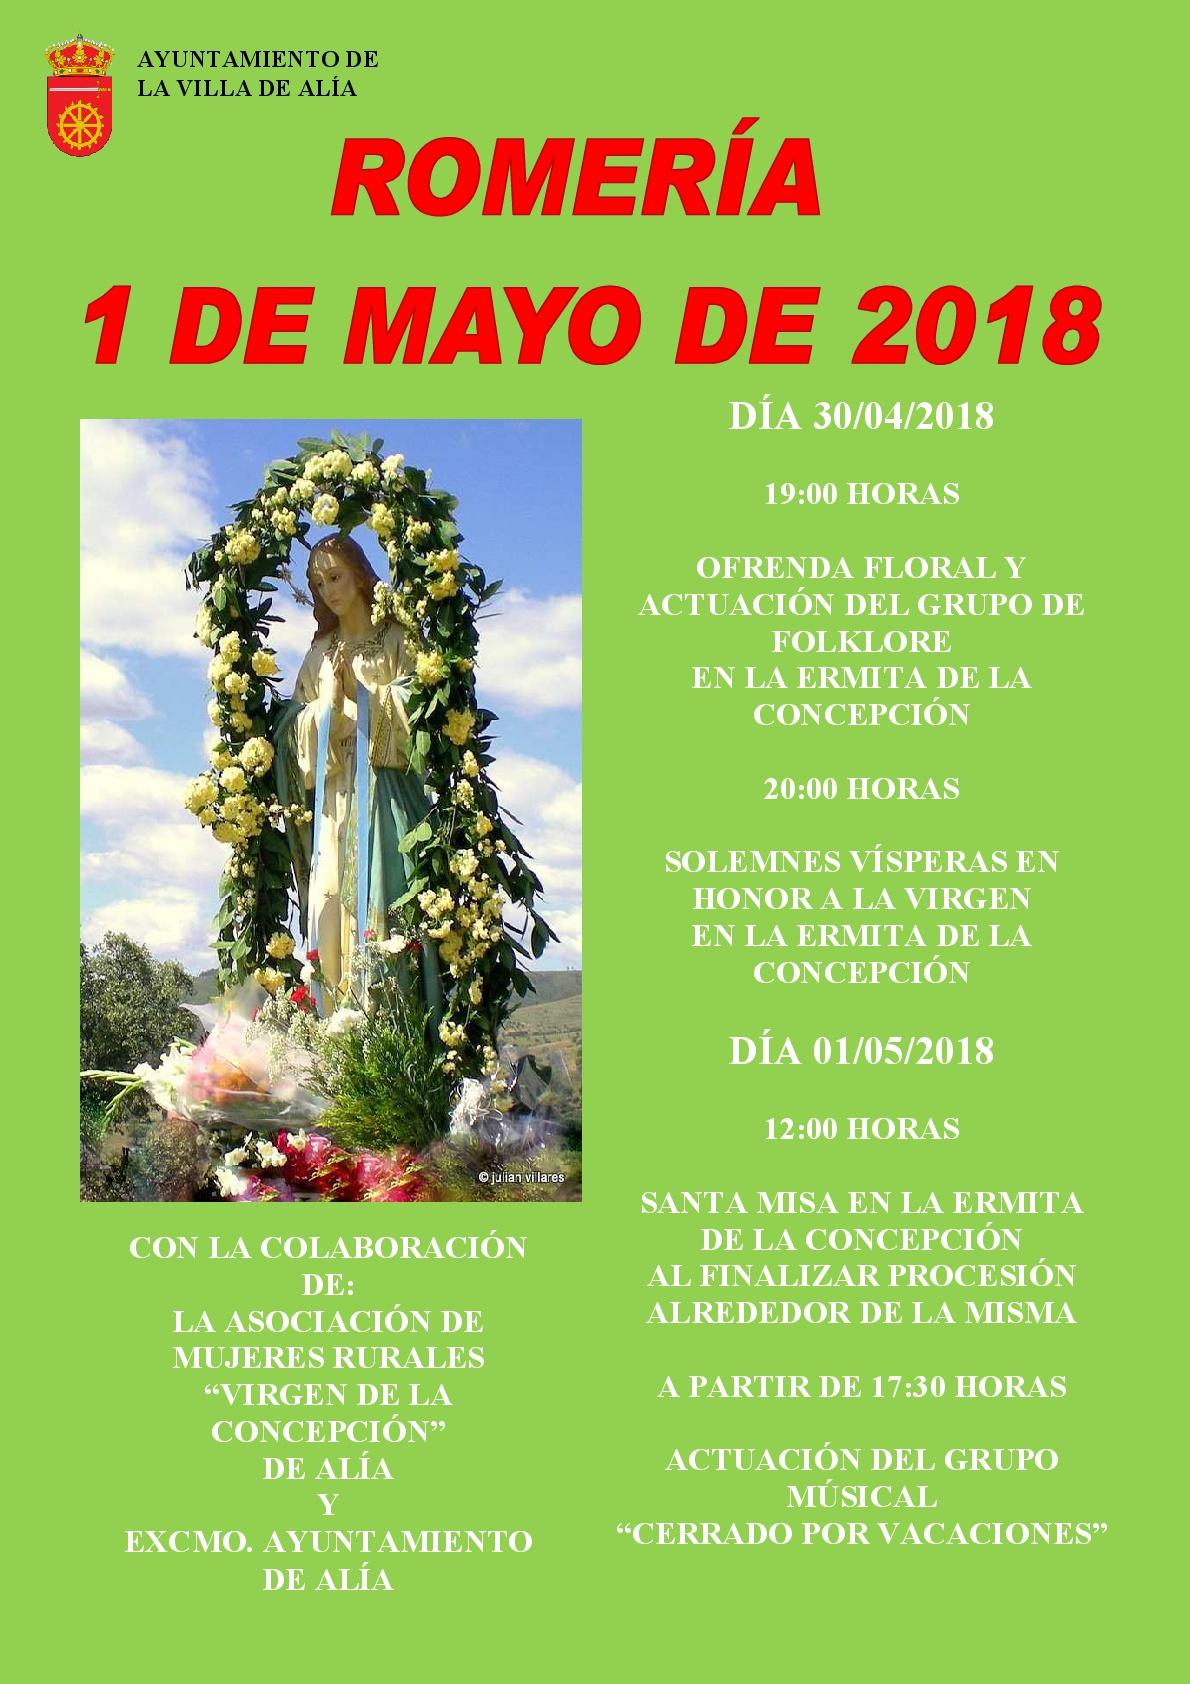 Romería 2018 - Alía